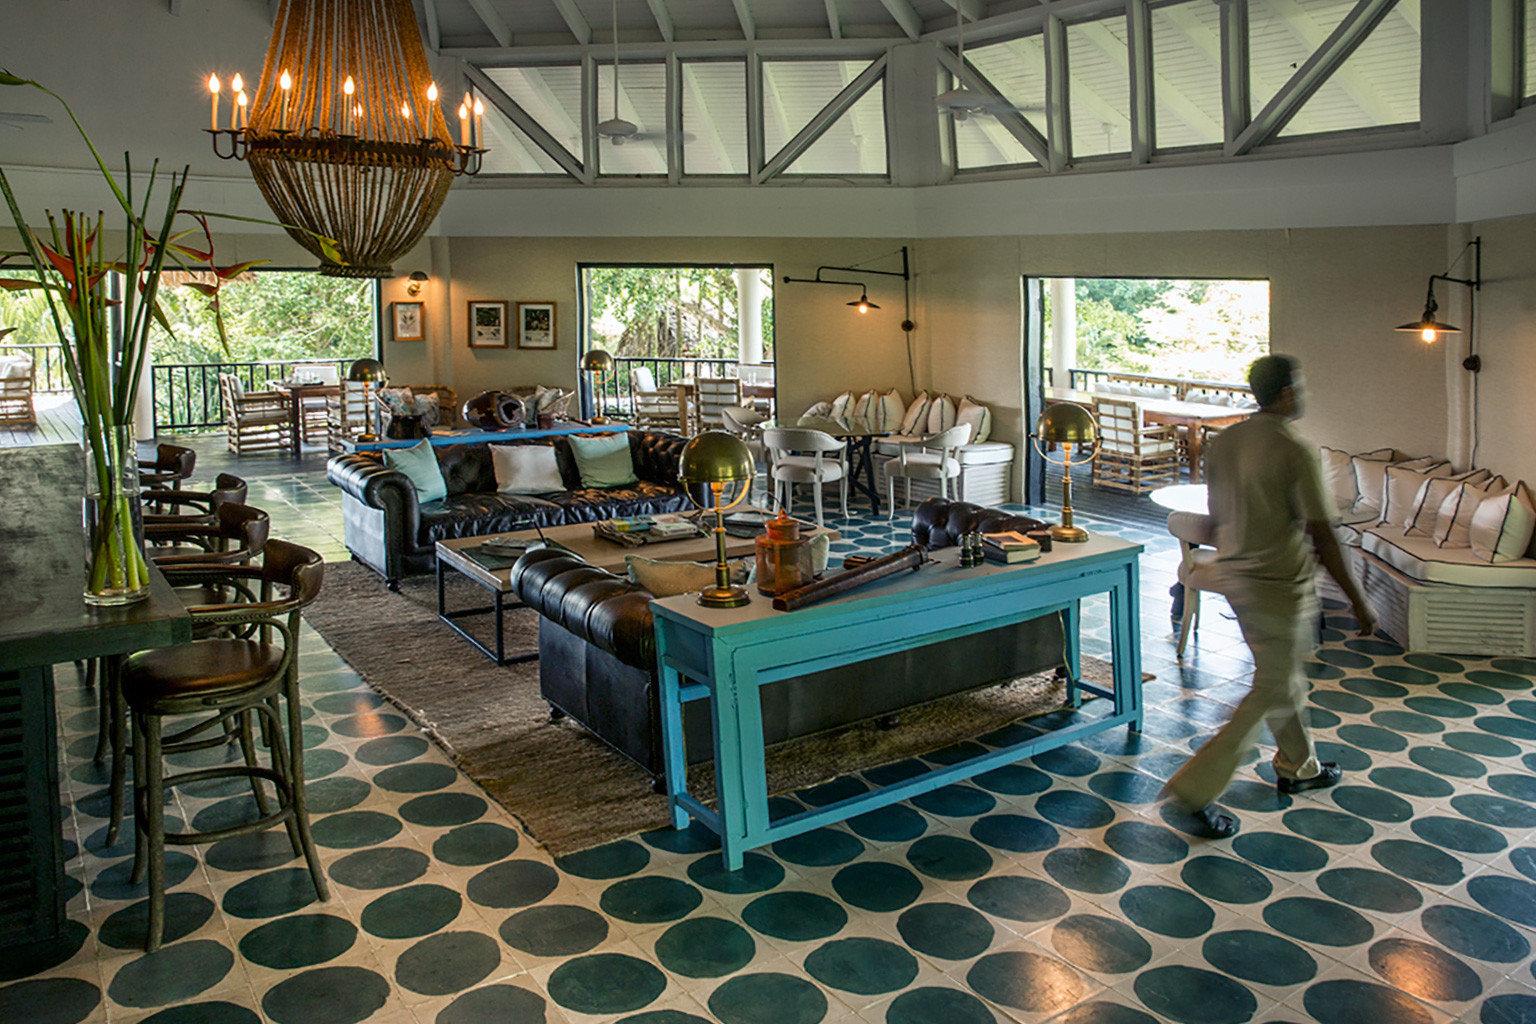 Dining Drink Eat Lodge property restaurant home Resort Lobby